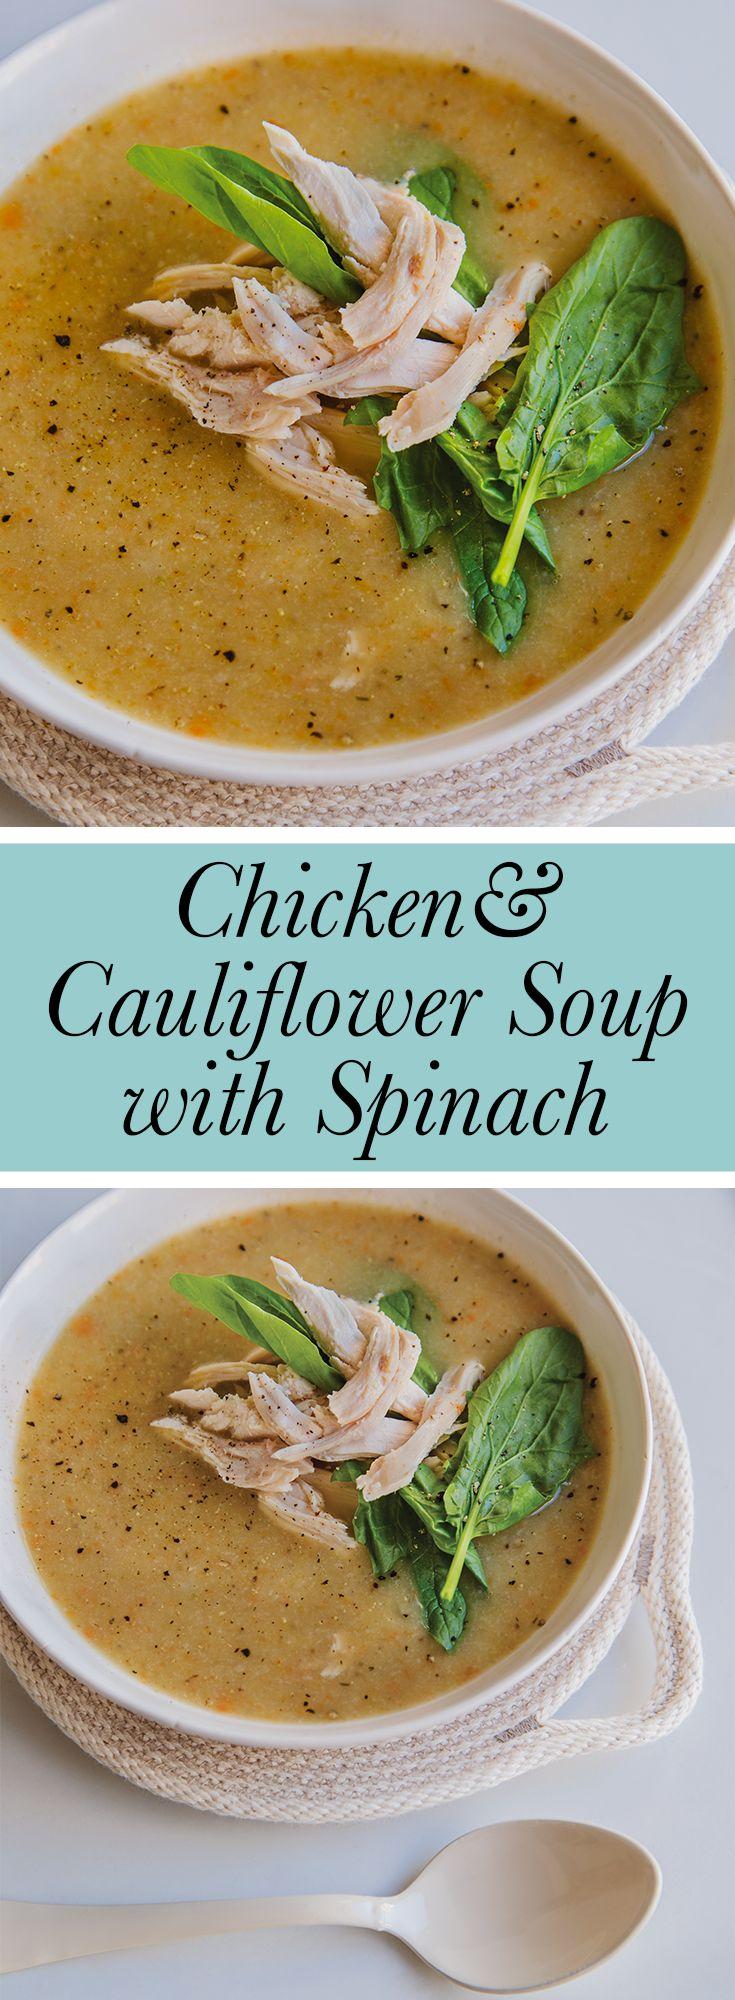 979 best food & drinks images on Pinterest | Cooking food, Seafood ...